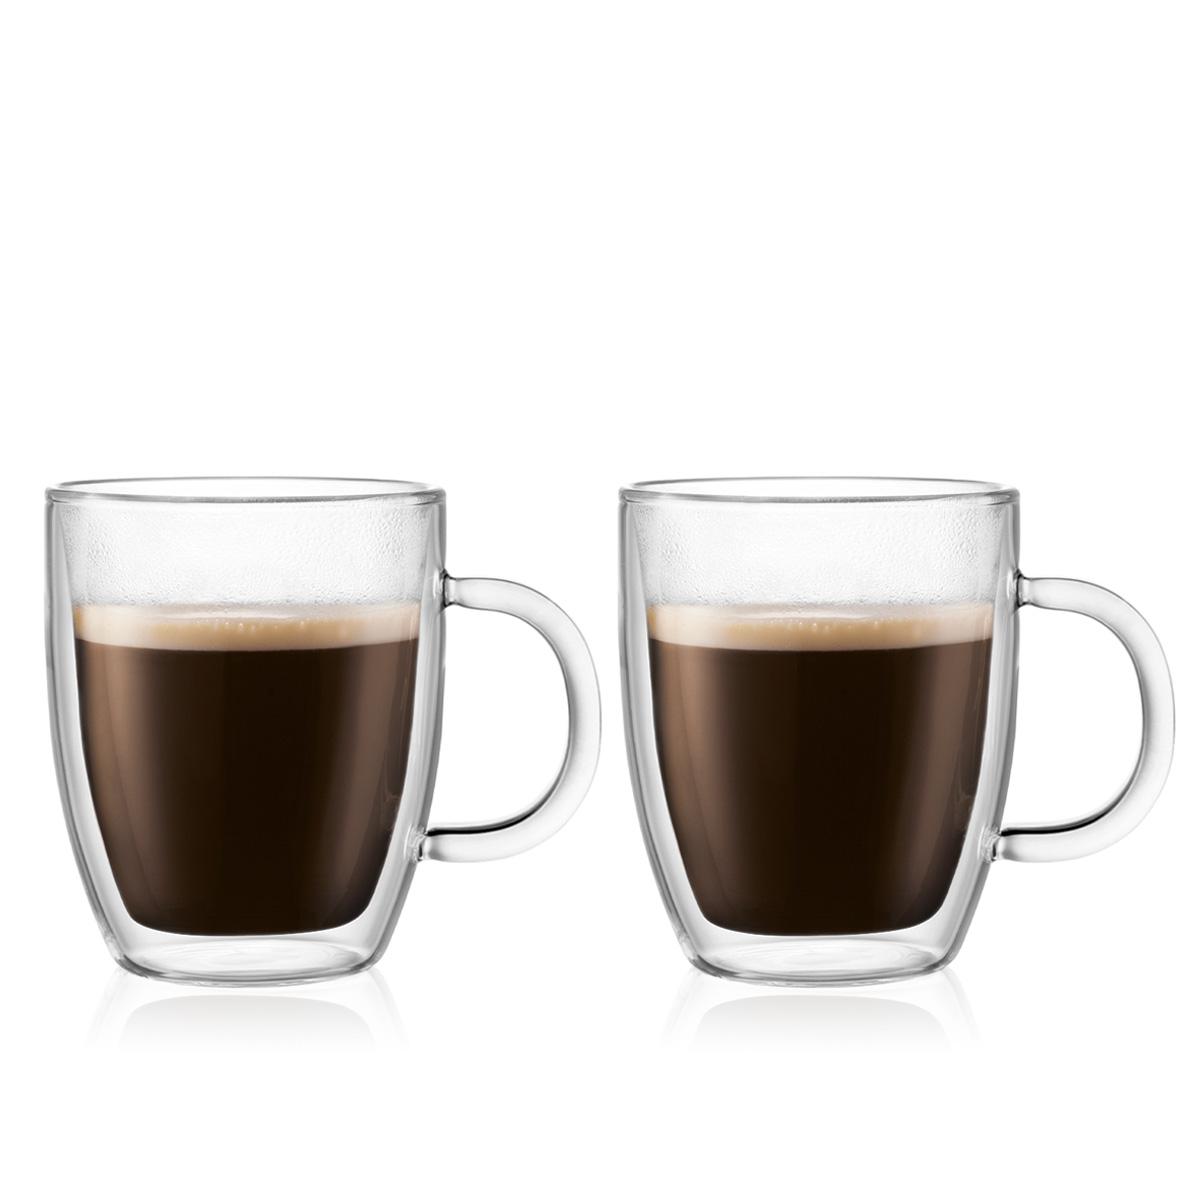 BISTRO: 2 chávenas de parede dupla, 0.3 l